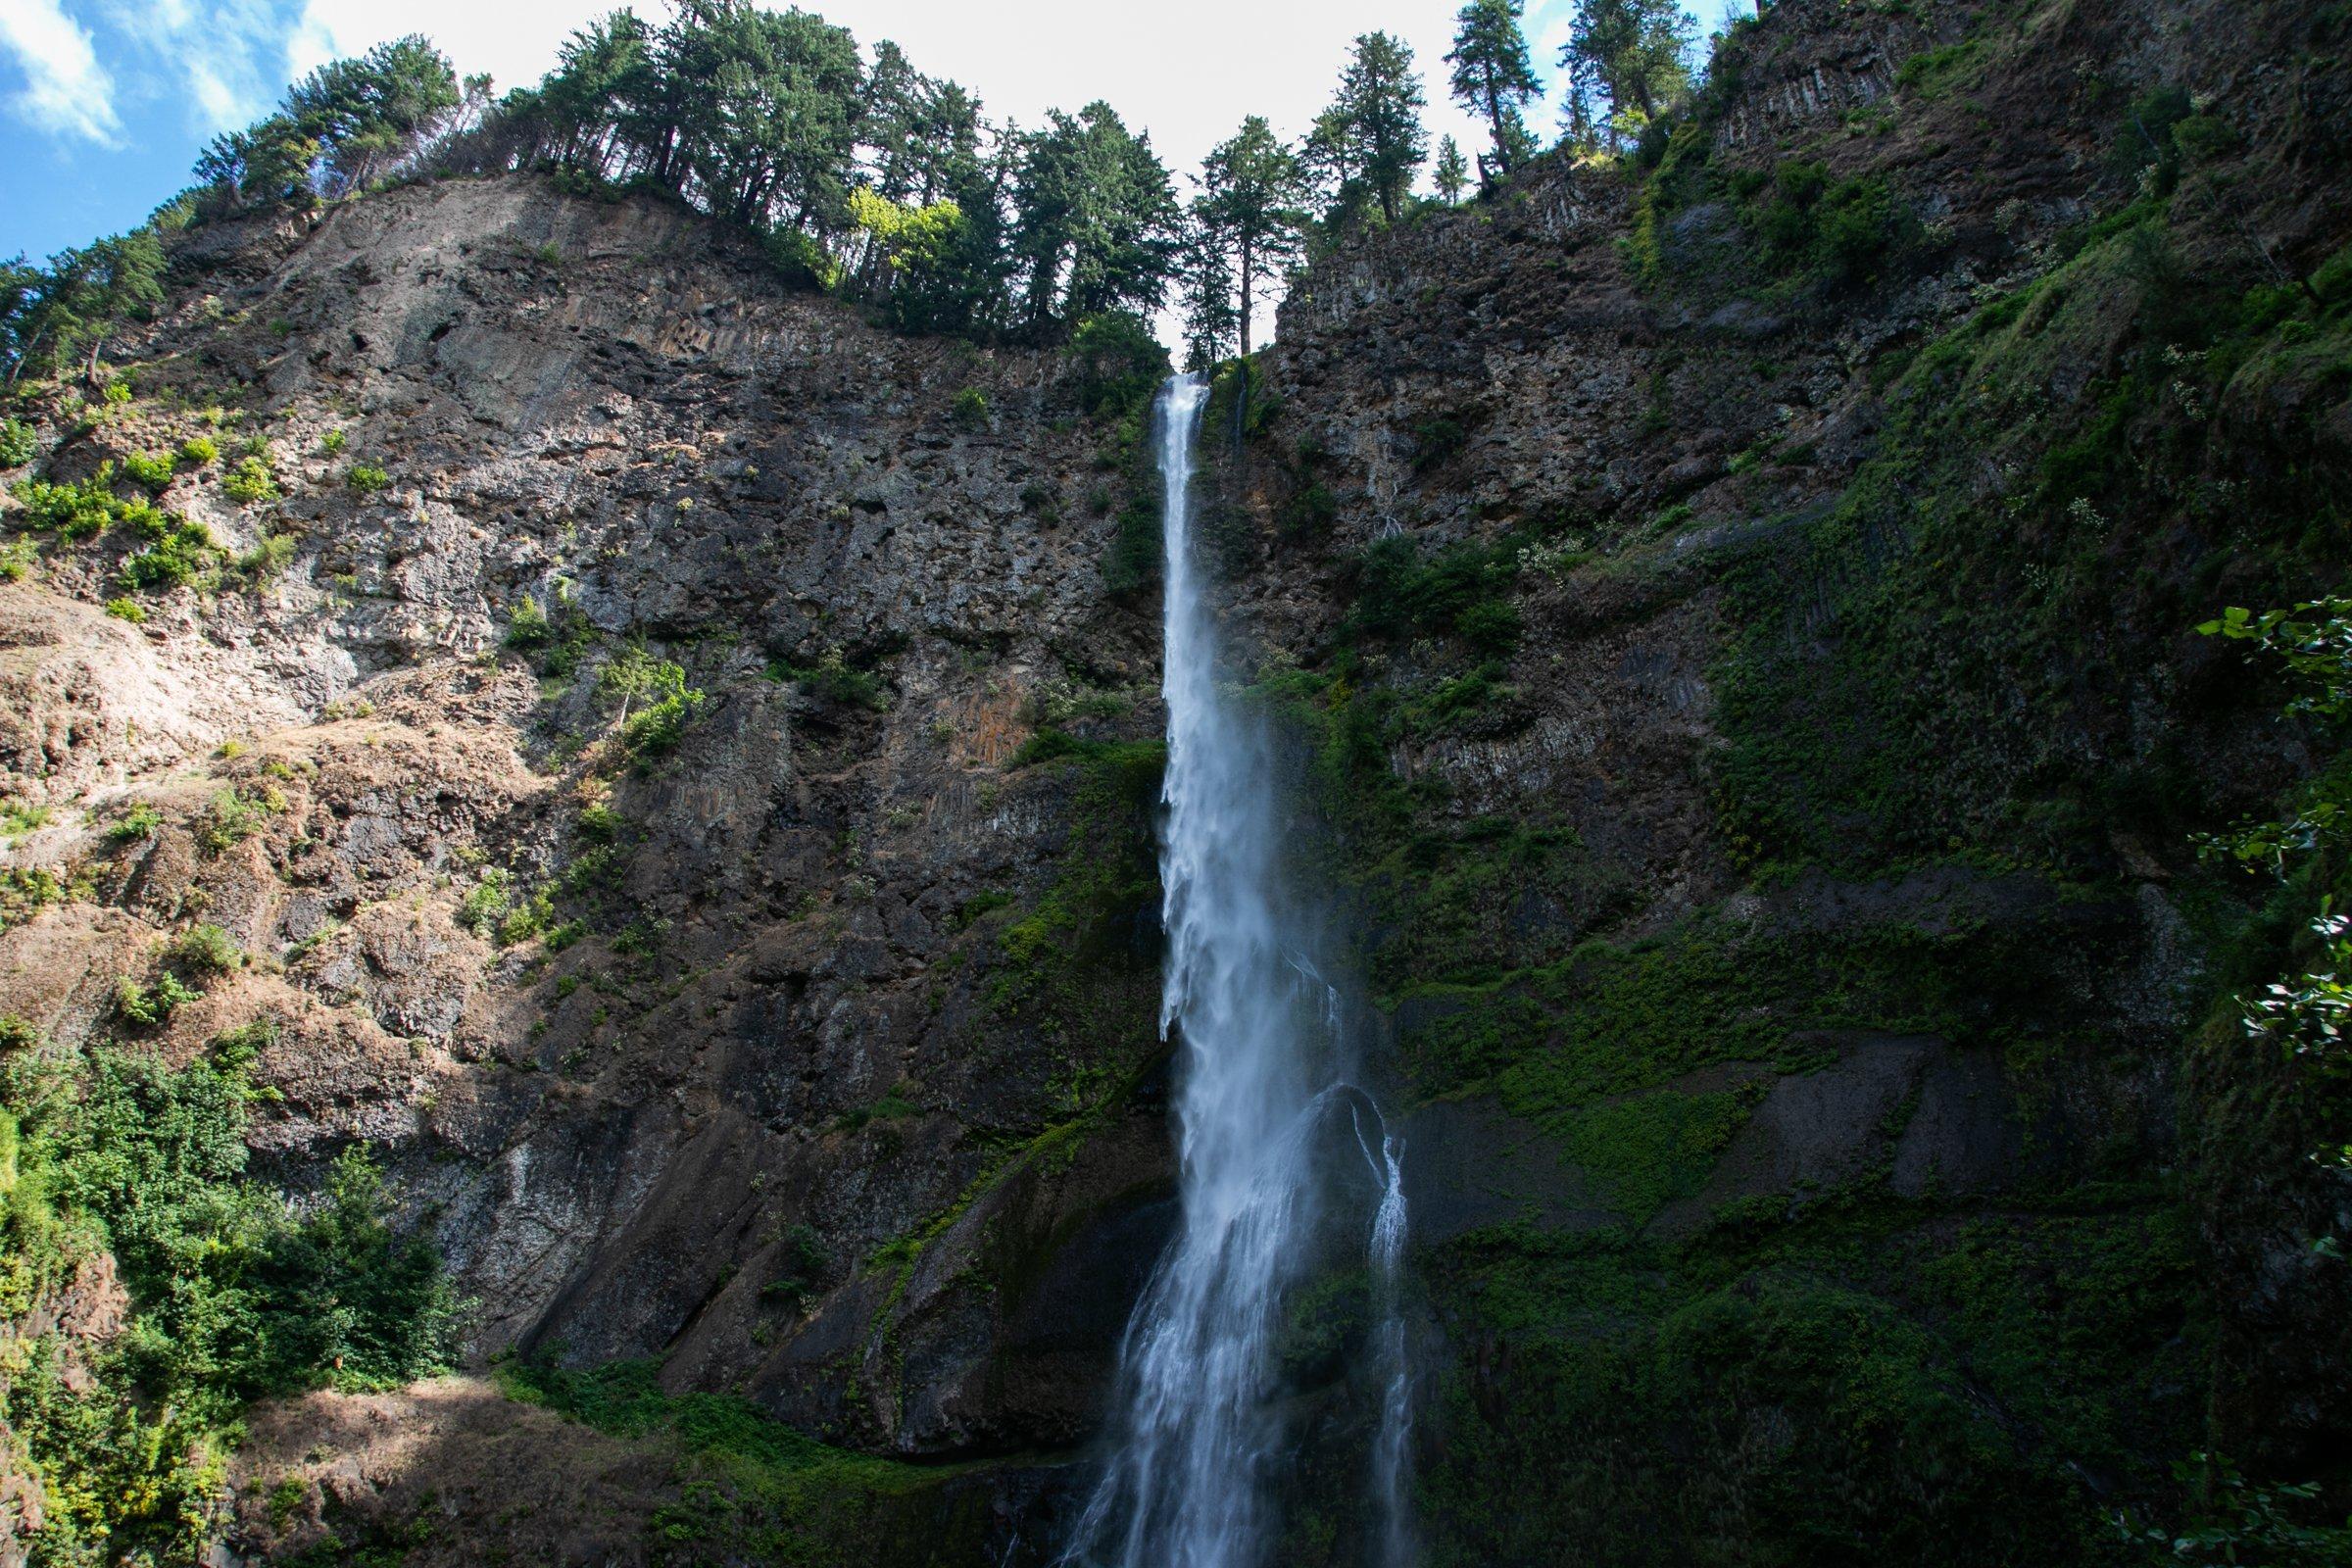 Long Narrow Waterfall On Mountain Cliff